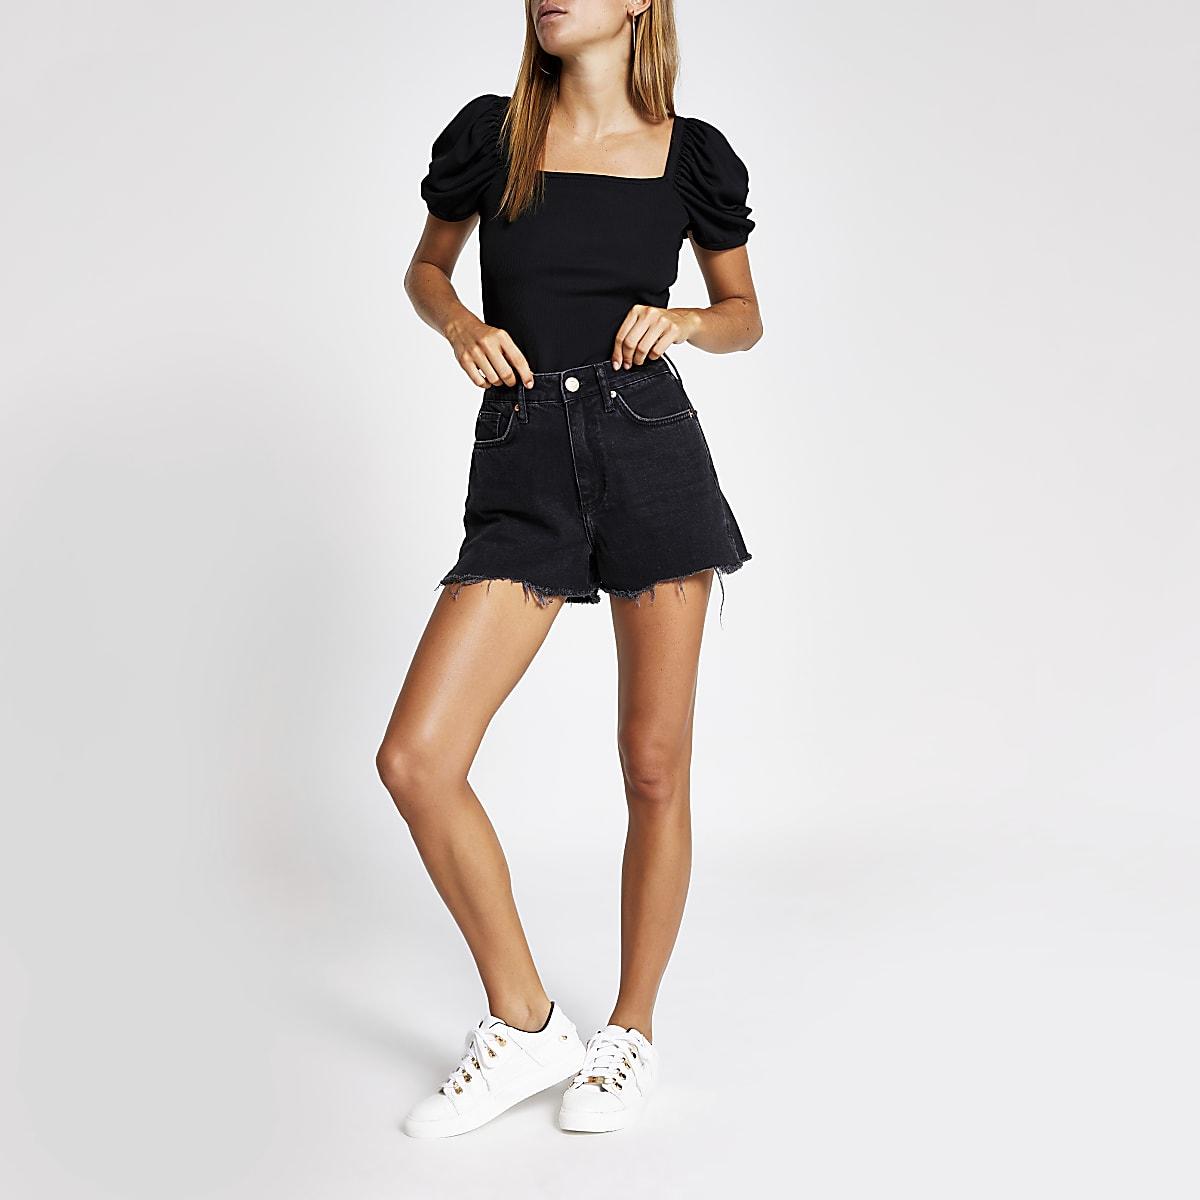 c4f83ed44fd Black Annie washed high waist denim shorts - Denim Shorts - Shorts ...